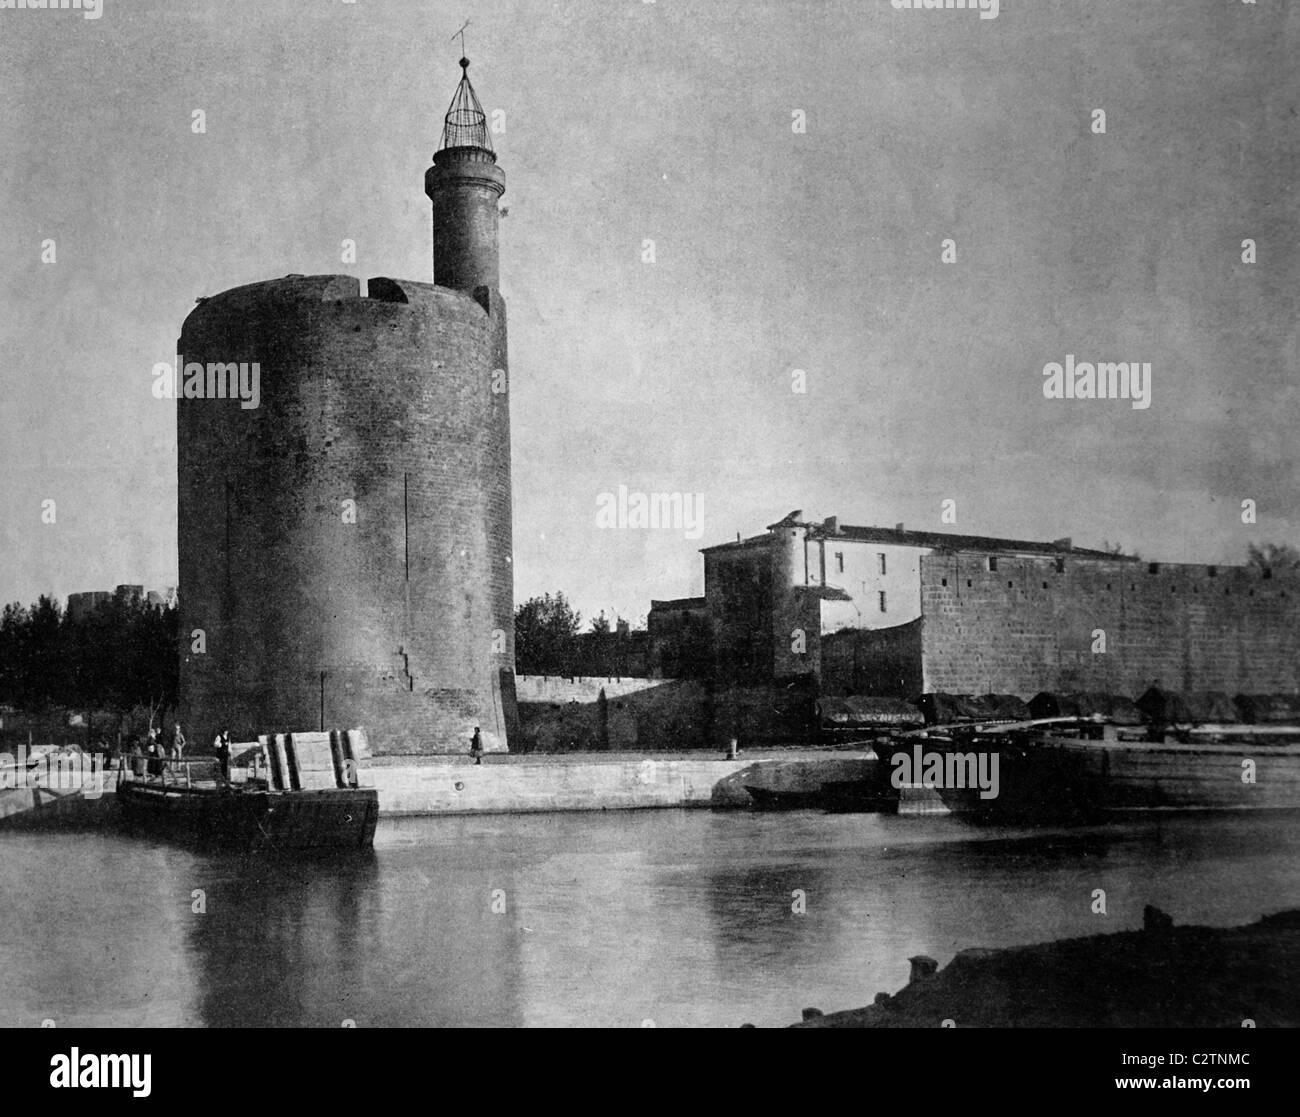 Early autotype of the Tour de Constance guard tower in Aigues Mortes, Département Gard, France, historical - Stock Image